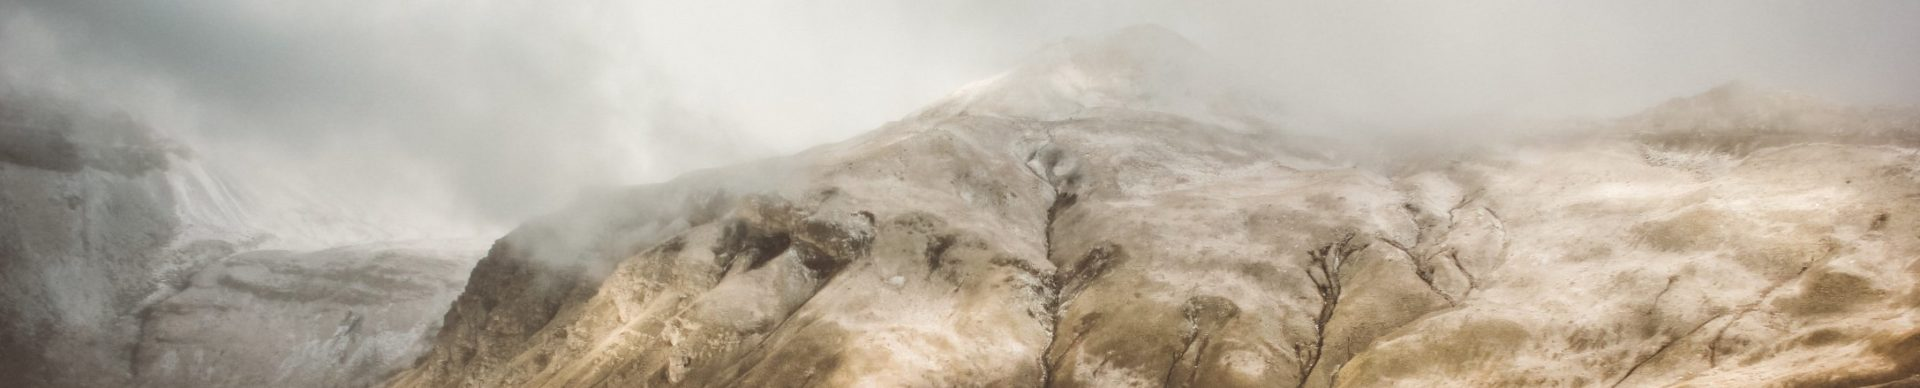 Col de Vars ©Théo Giacometti